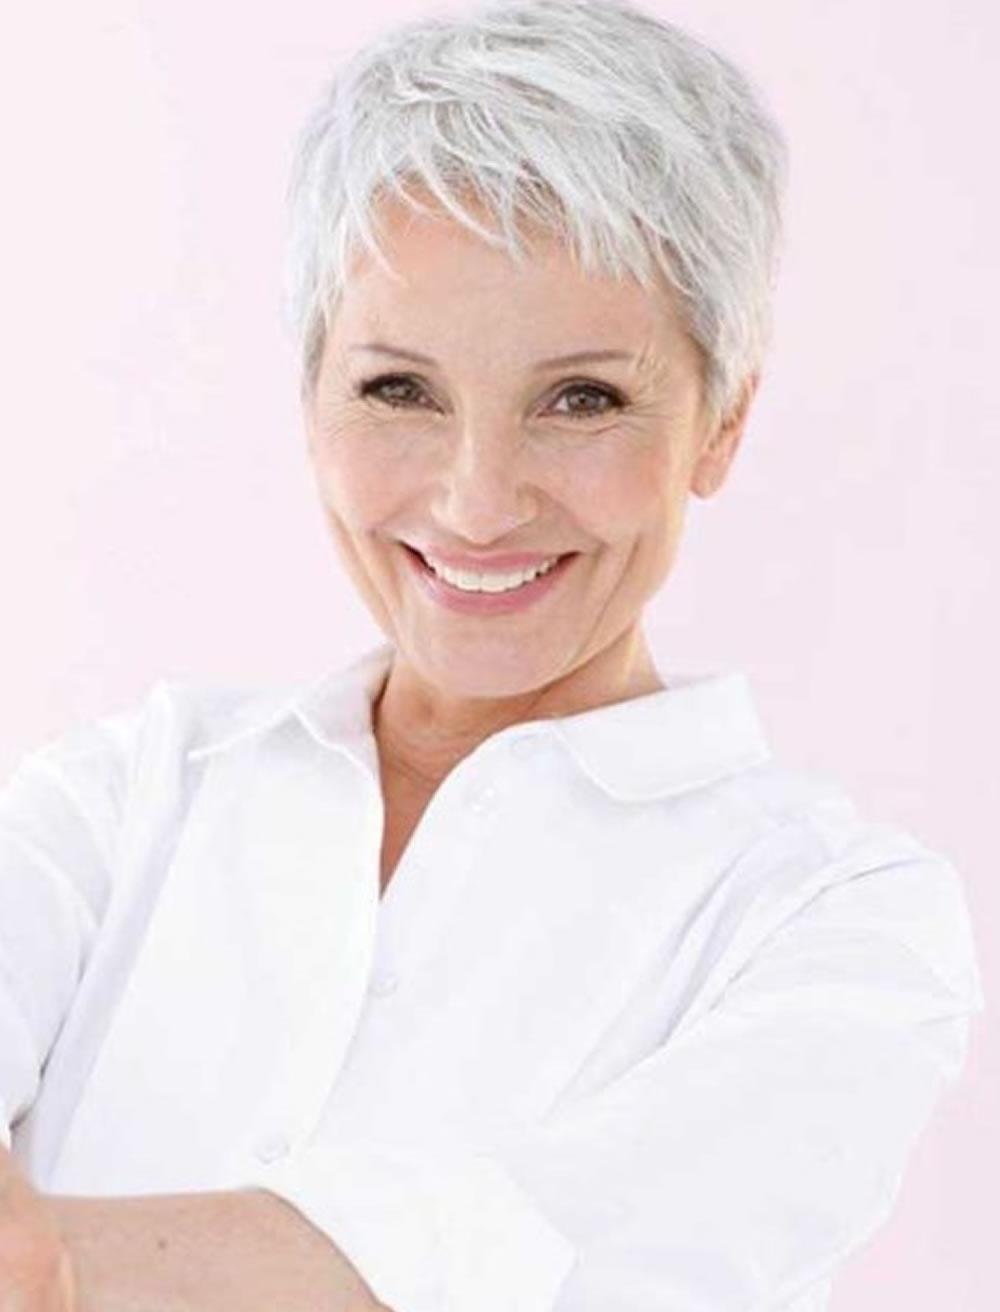 33 Top Pixie Hairstyles For Older Women | Short Pixie Haircuts For Within Recent Pixie Hairstyles For Older Ladies (View 7 of 15)